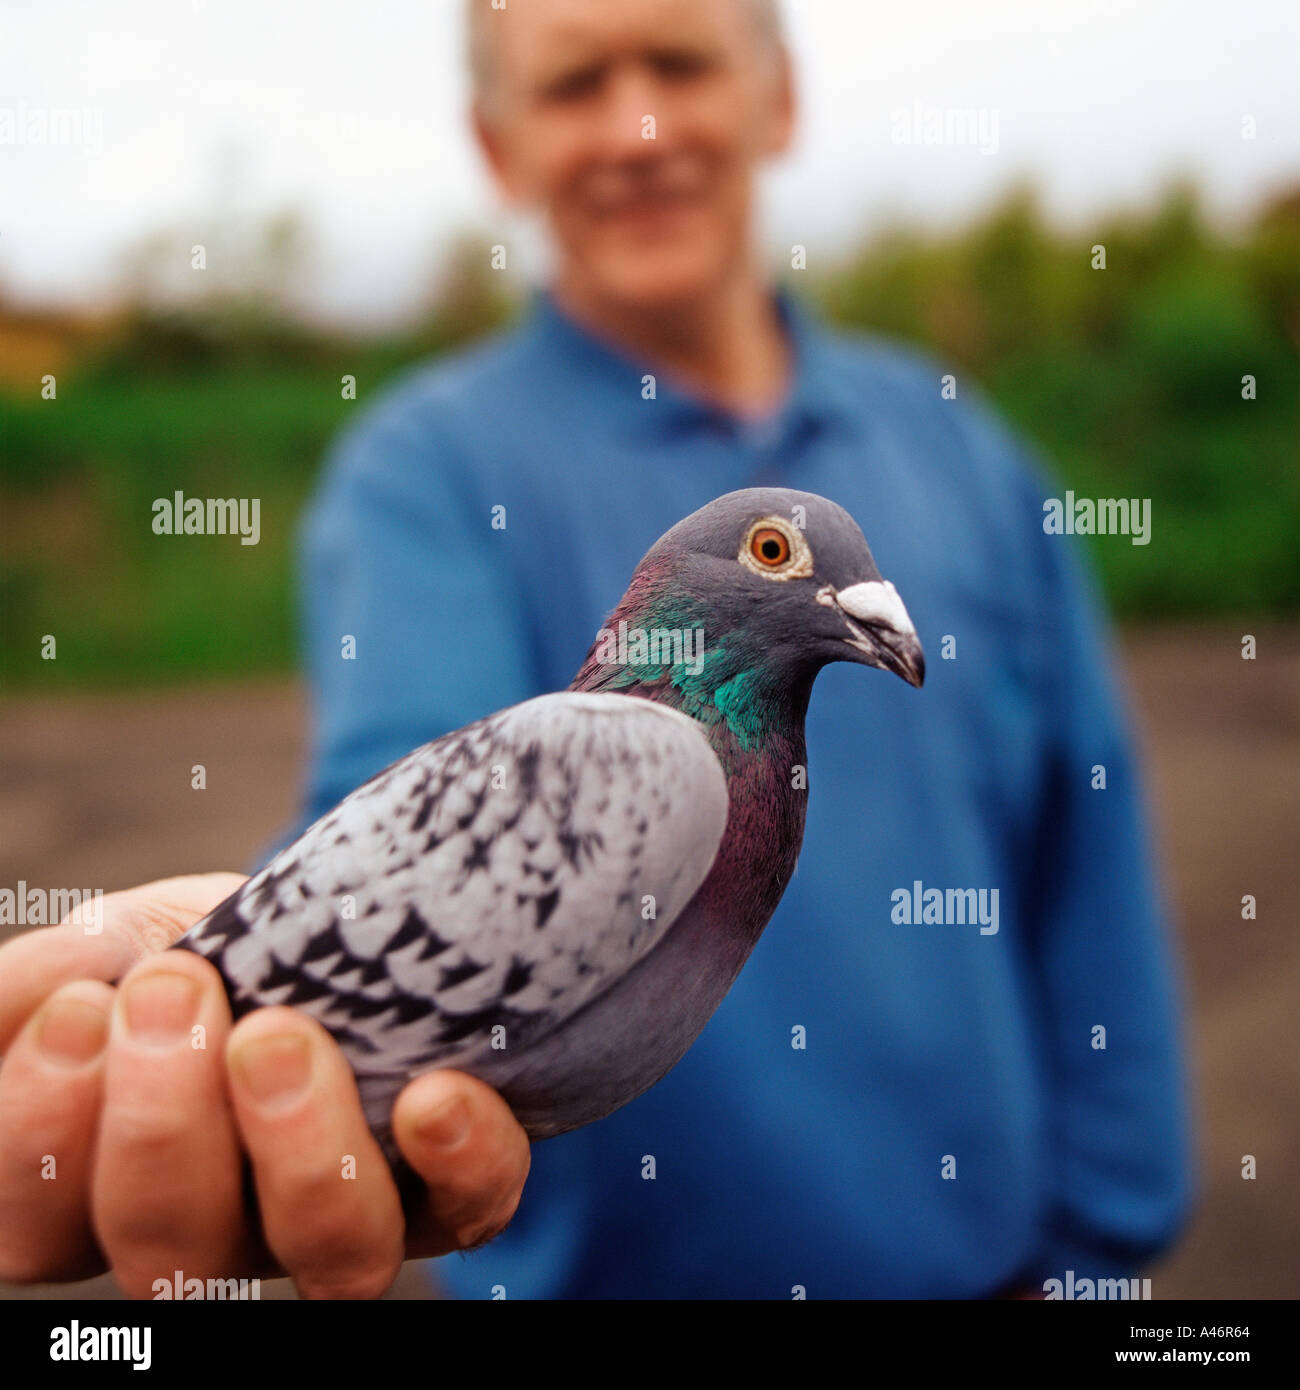 Man holding pigeon pet Photo Stock